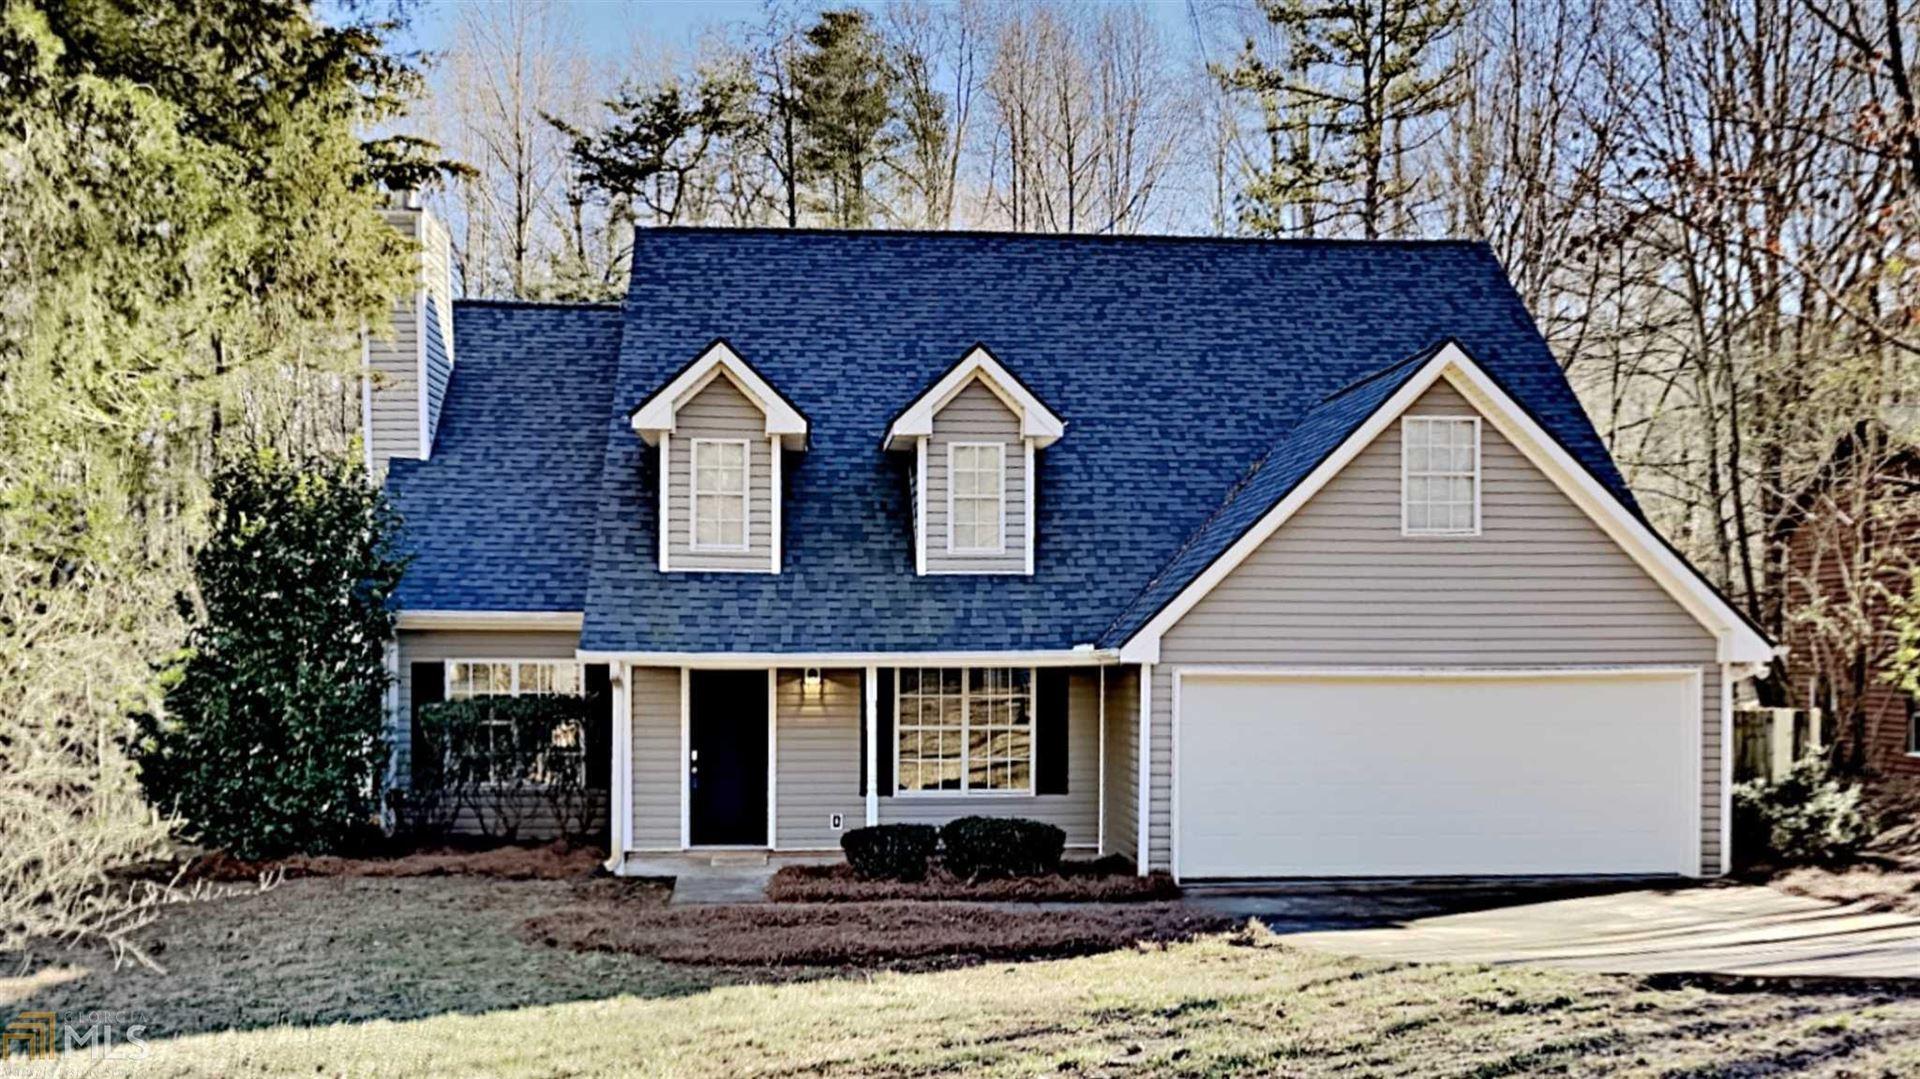 9525 Manor Ln, Gainesville, GA 30506 - #: 8933001